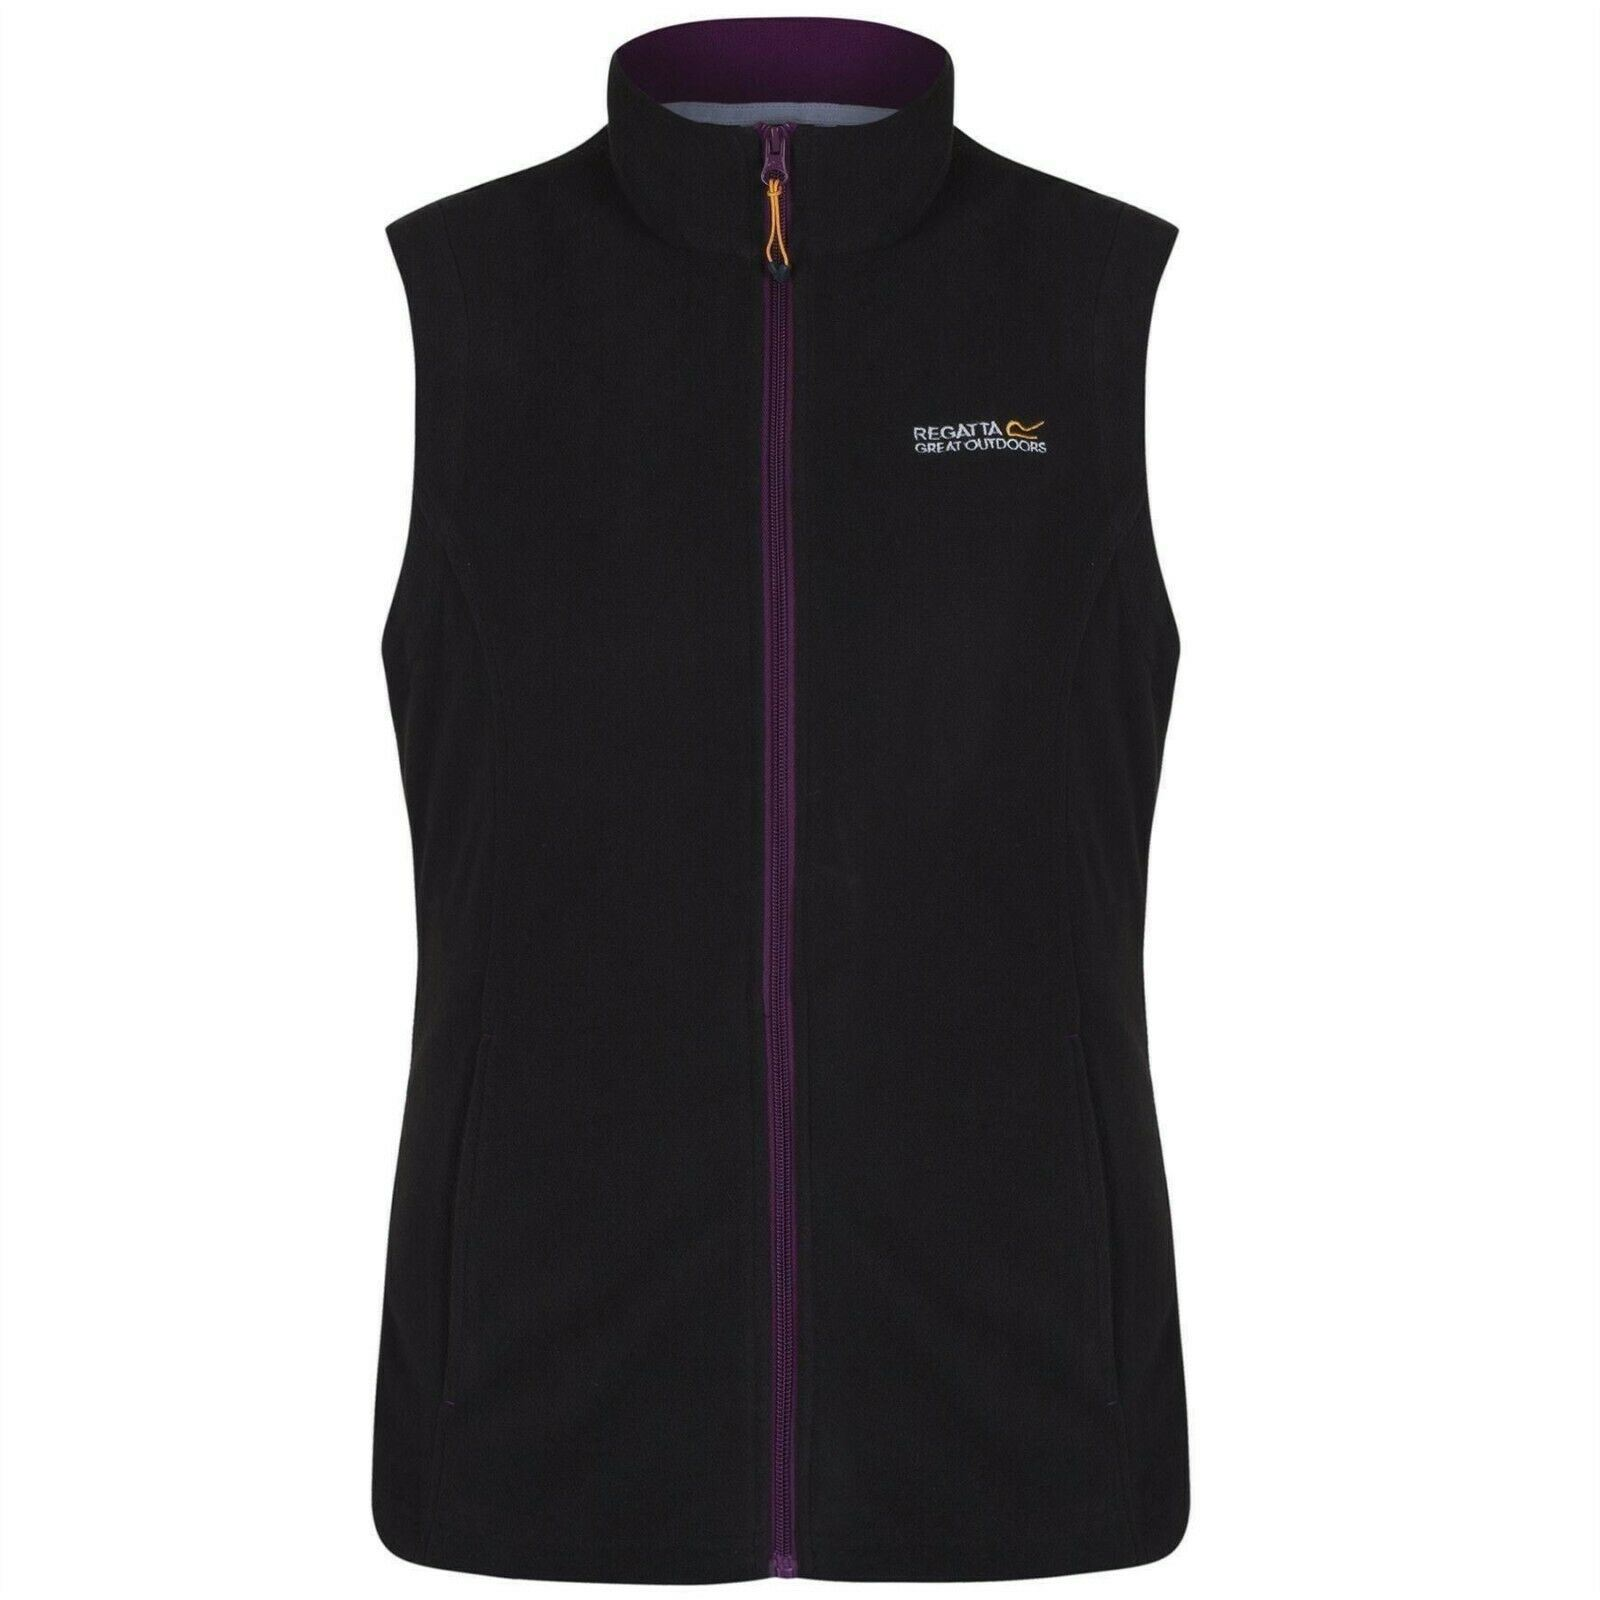 miniatuur 5 - Regatta Womens Sweetness Full Zip Micro Fleece Casual Bodywarmer Waistcoat